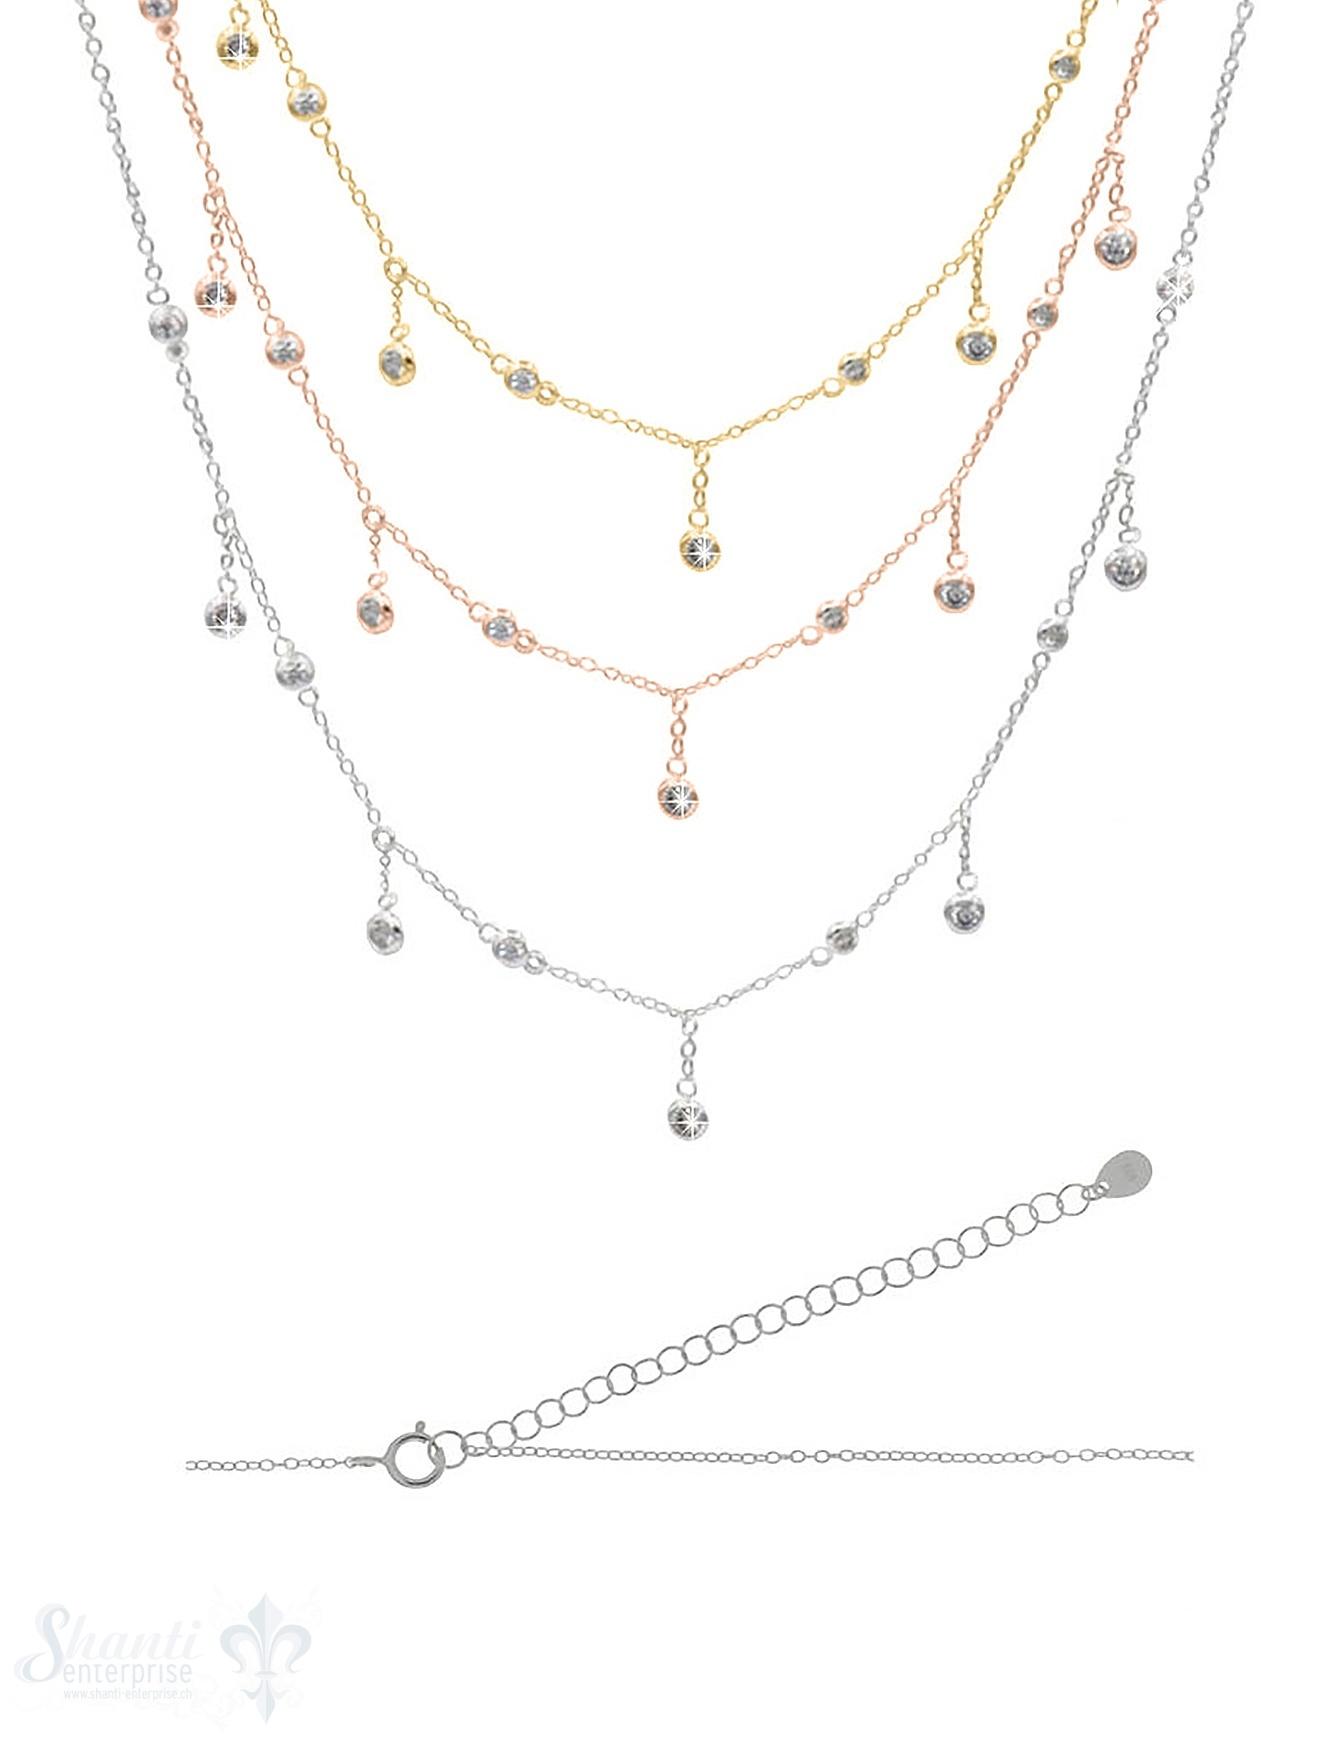 Halskette kurz Silber Anker mit Zirkonia kurz/lang